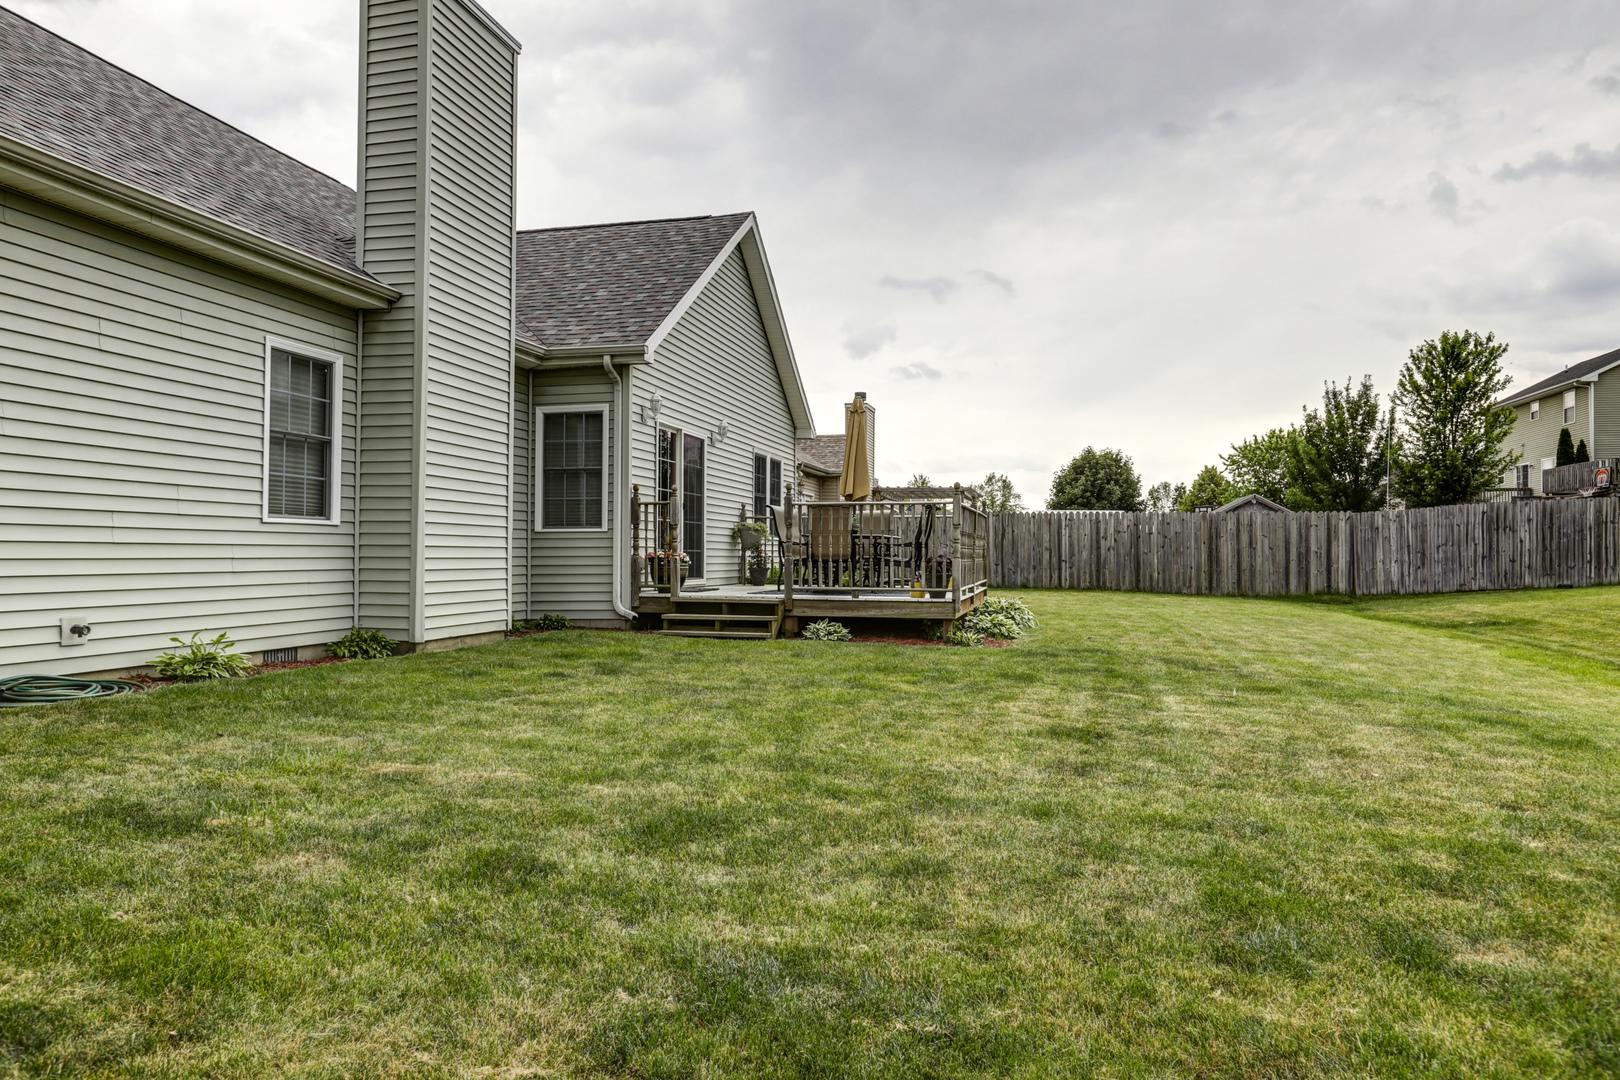 608 Sycamore, St. Joseph, Illinois, 61873